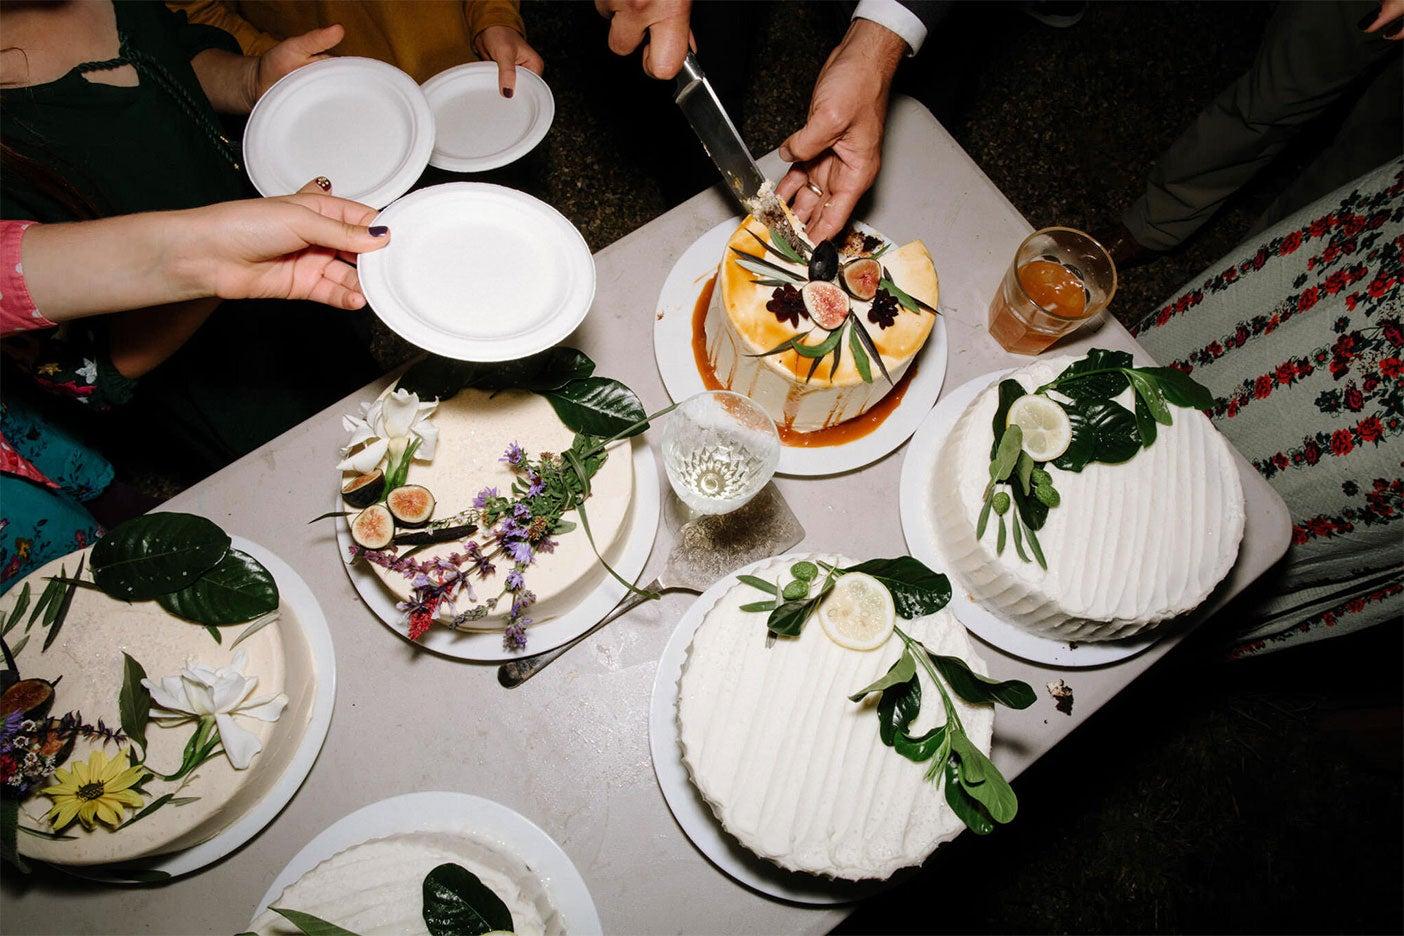 wedding cakes being cut